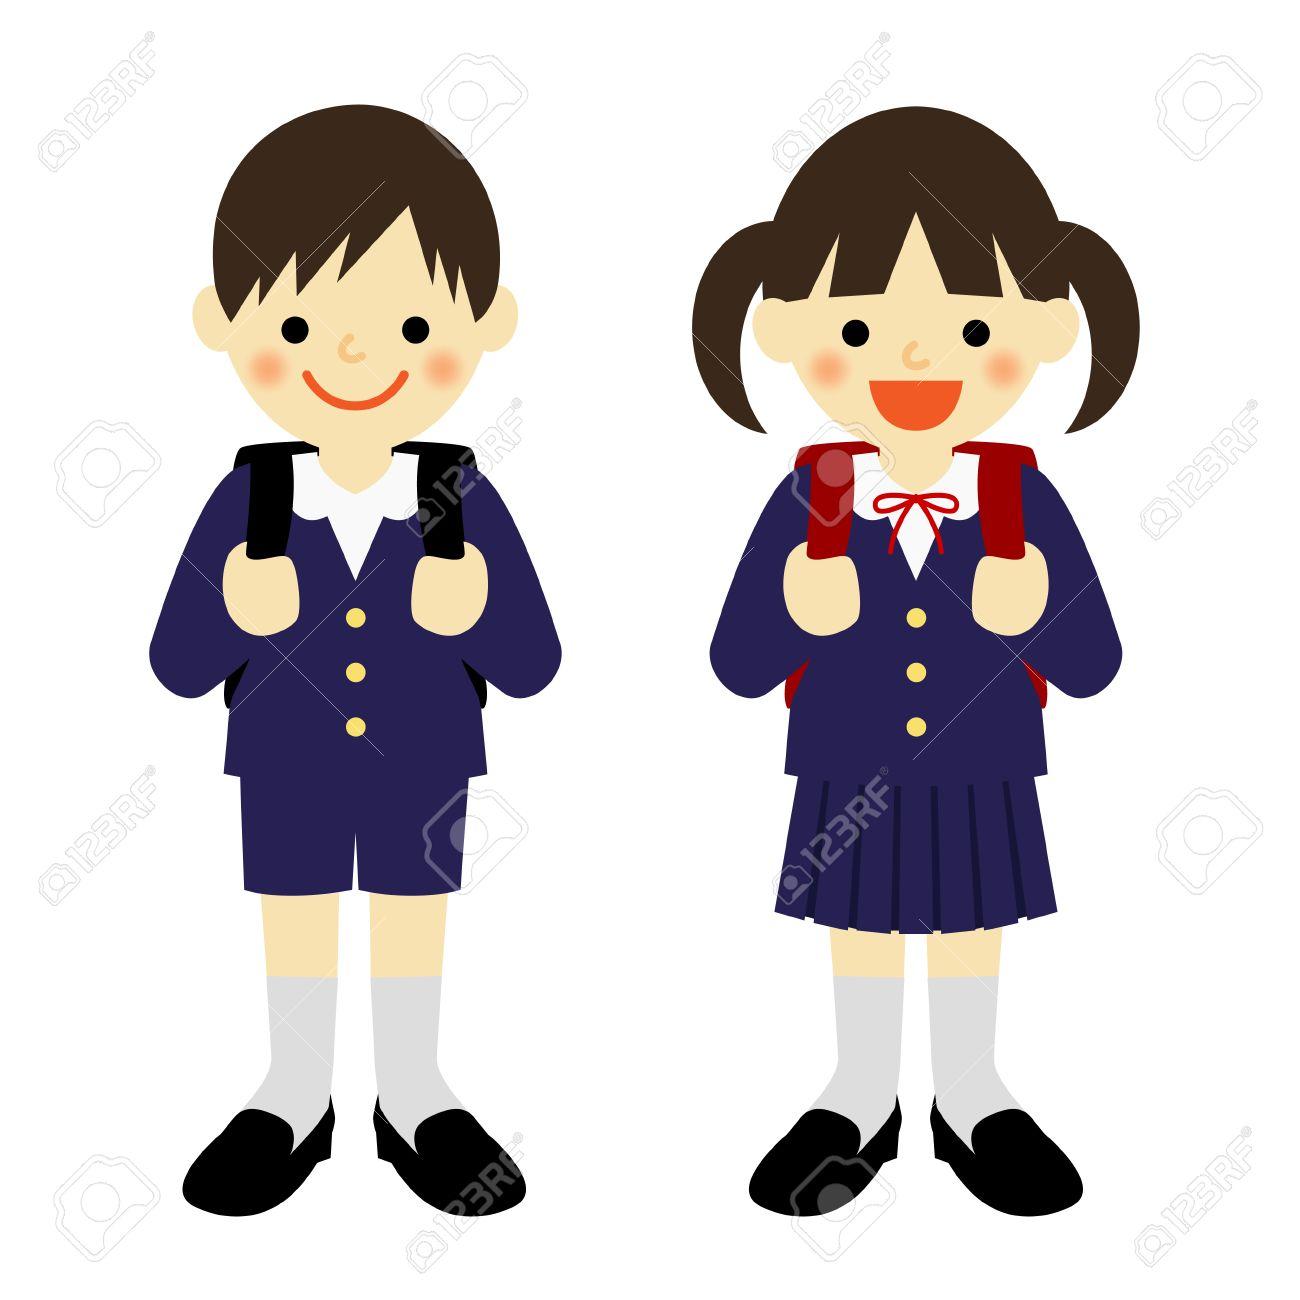 920 japanese school uniform cliparts stock vector and royalty free rh 123rf com school uniform clipart free girl school uniform clipart